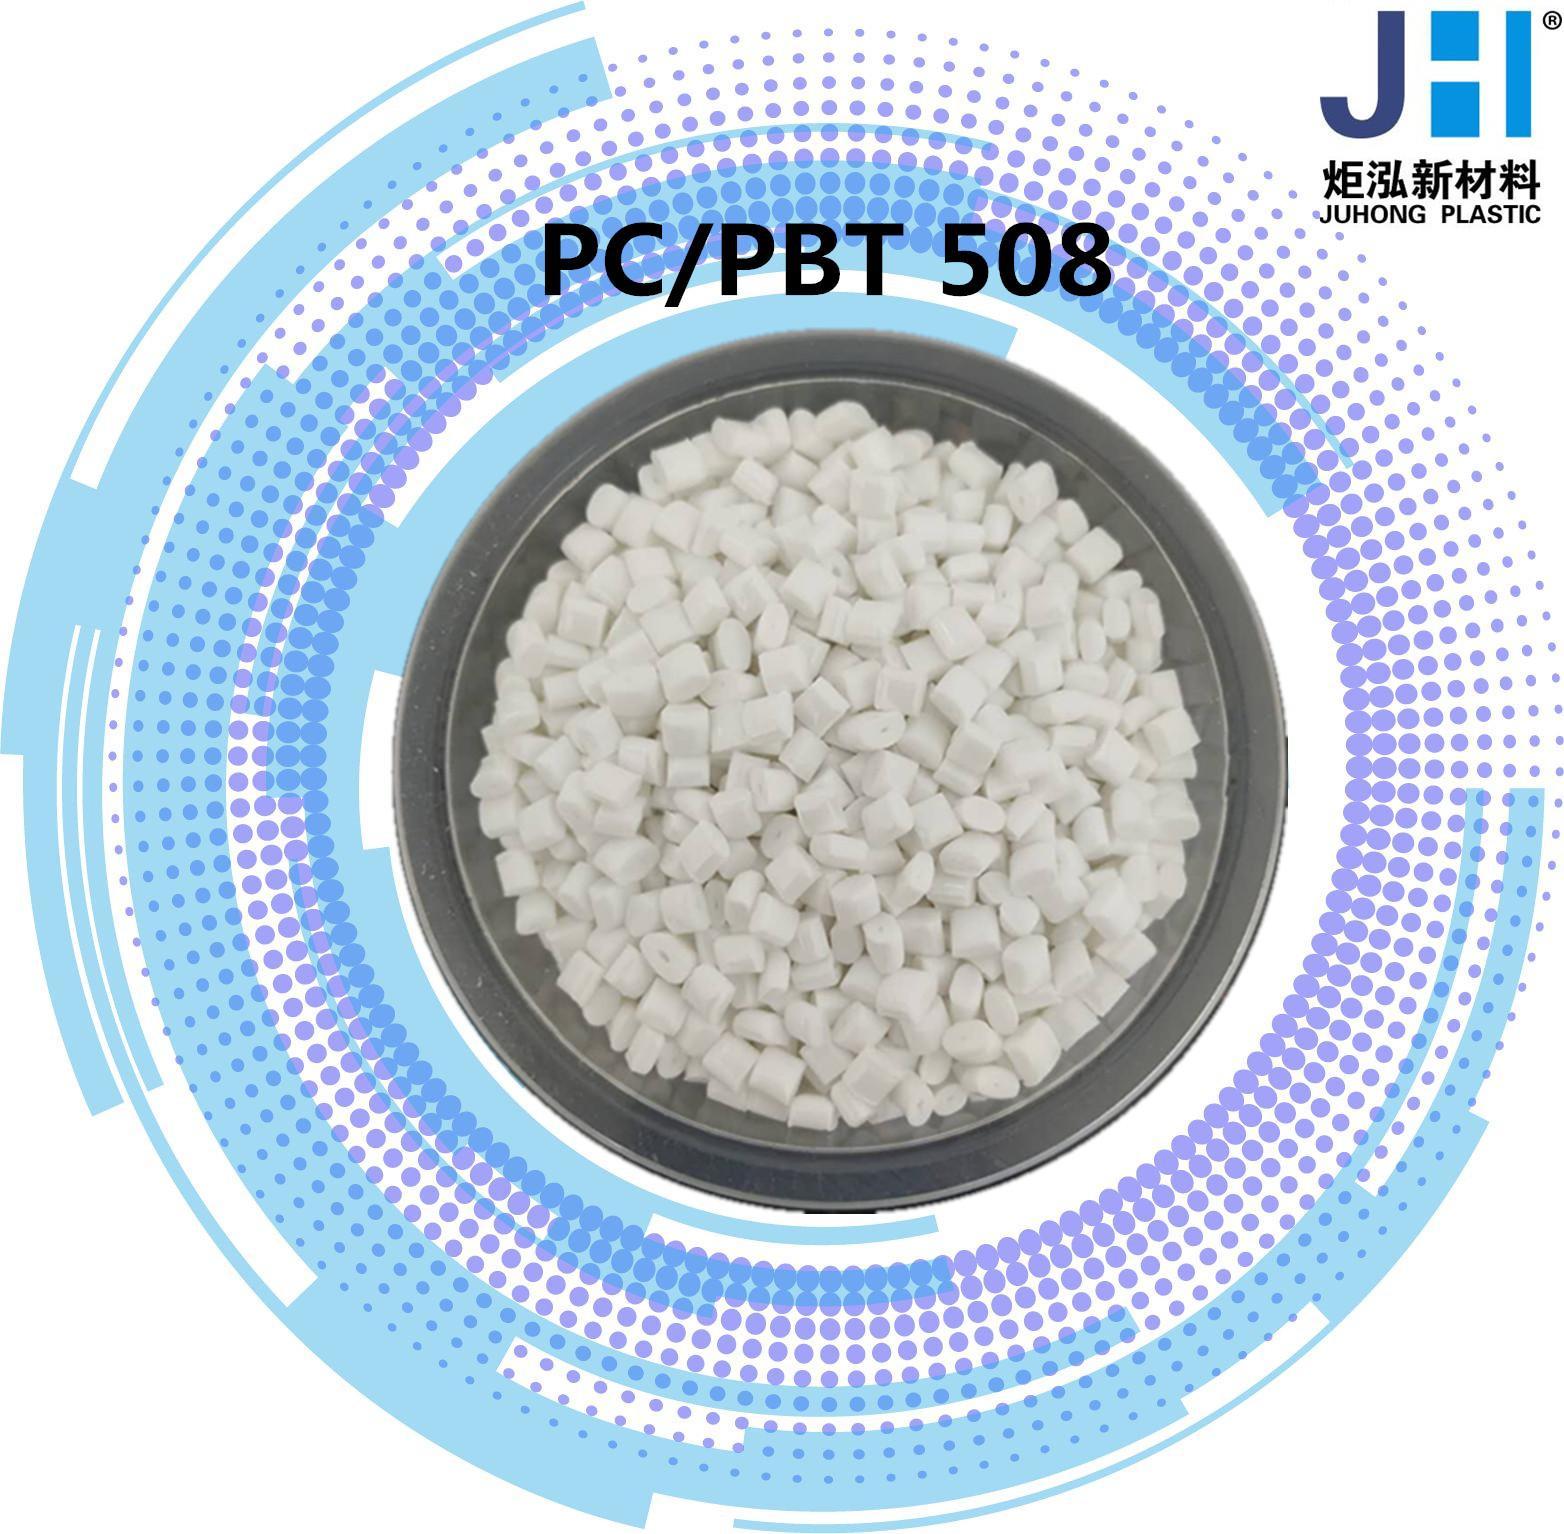 PC-PBT glass fiber reinforced JH-508 household appliances handle material 2